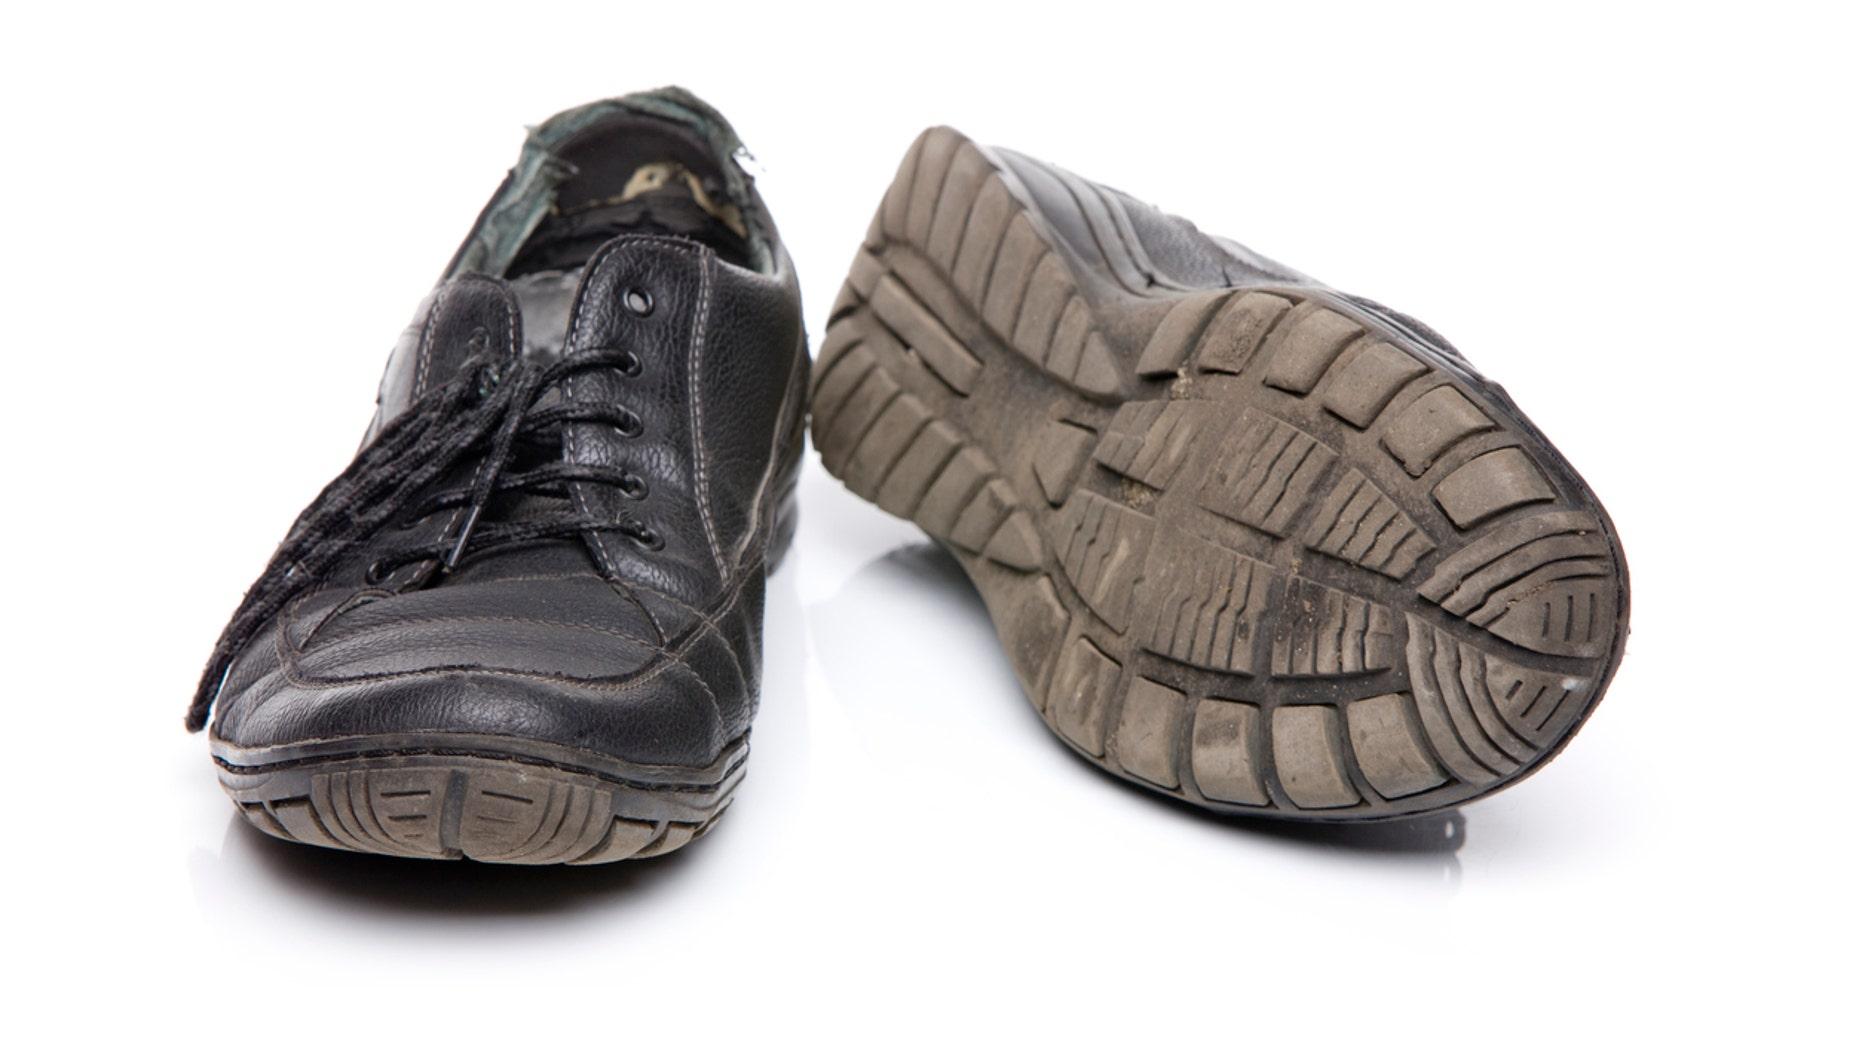 Old shoes XXXL